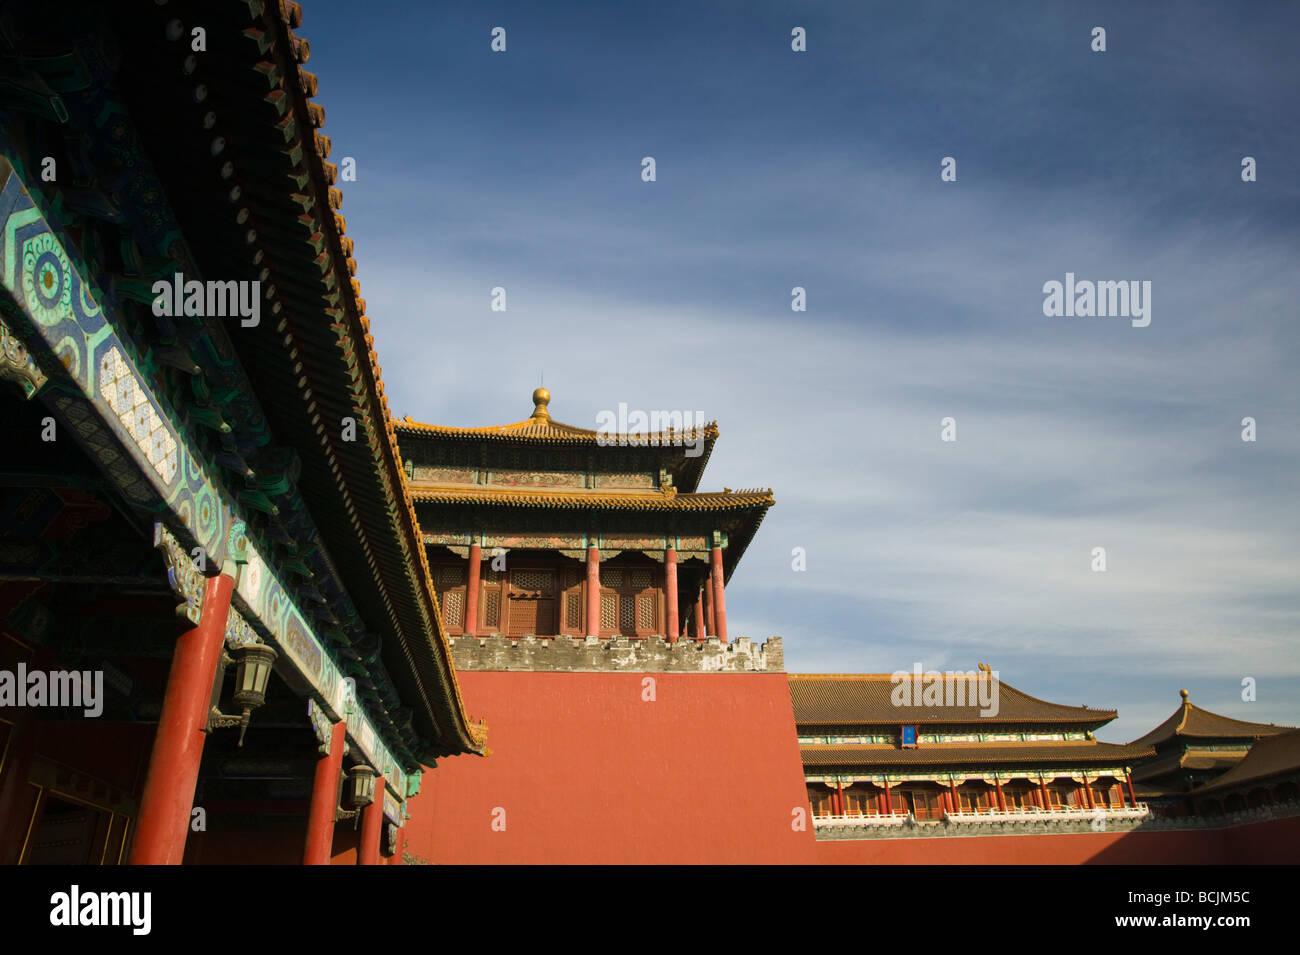 China, Pekín, la Ciudad Prohibida, Meridian Gate Imagen De Stock